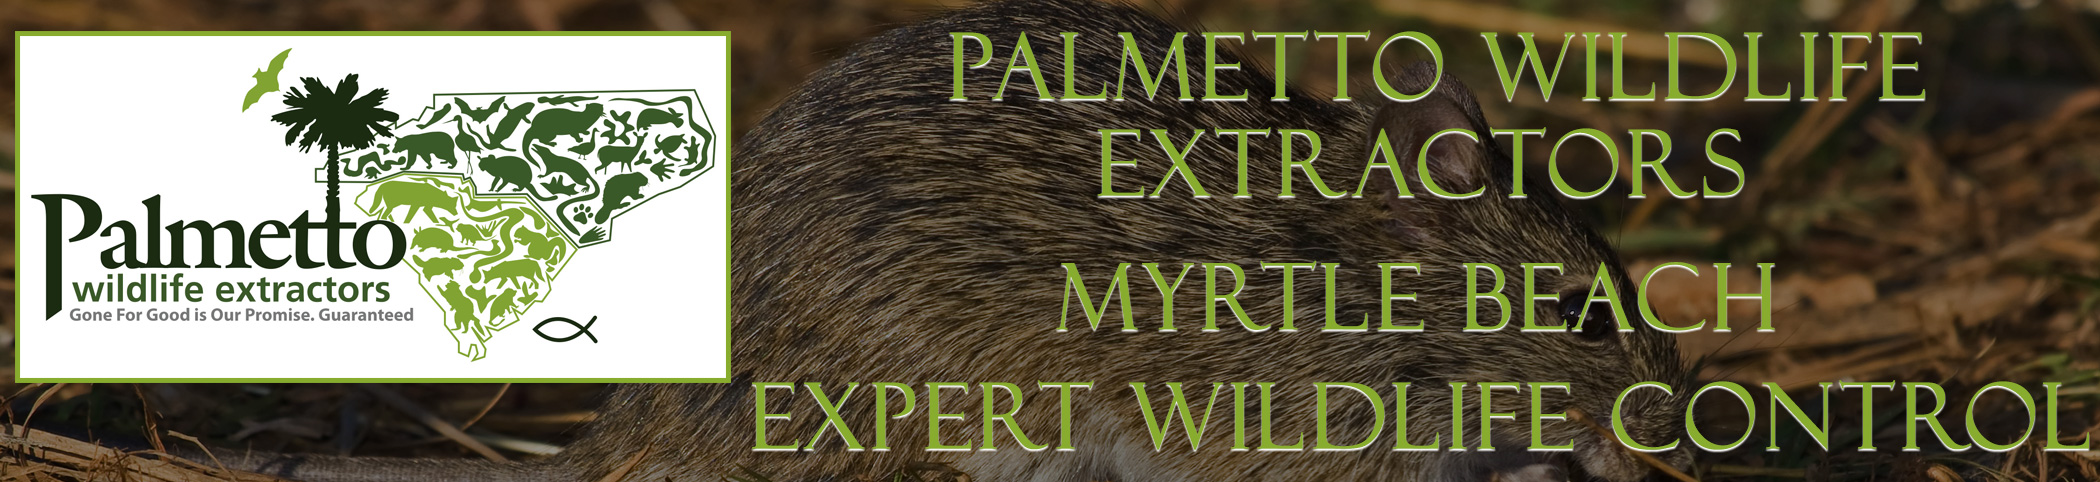 Palmetto Wildlife Extractors Myrtle Beach South Carolina header image